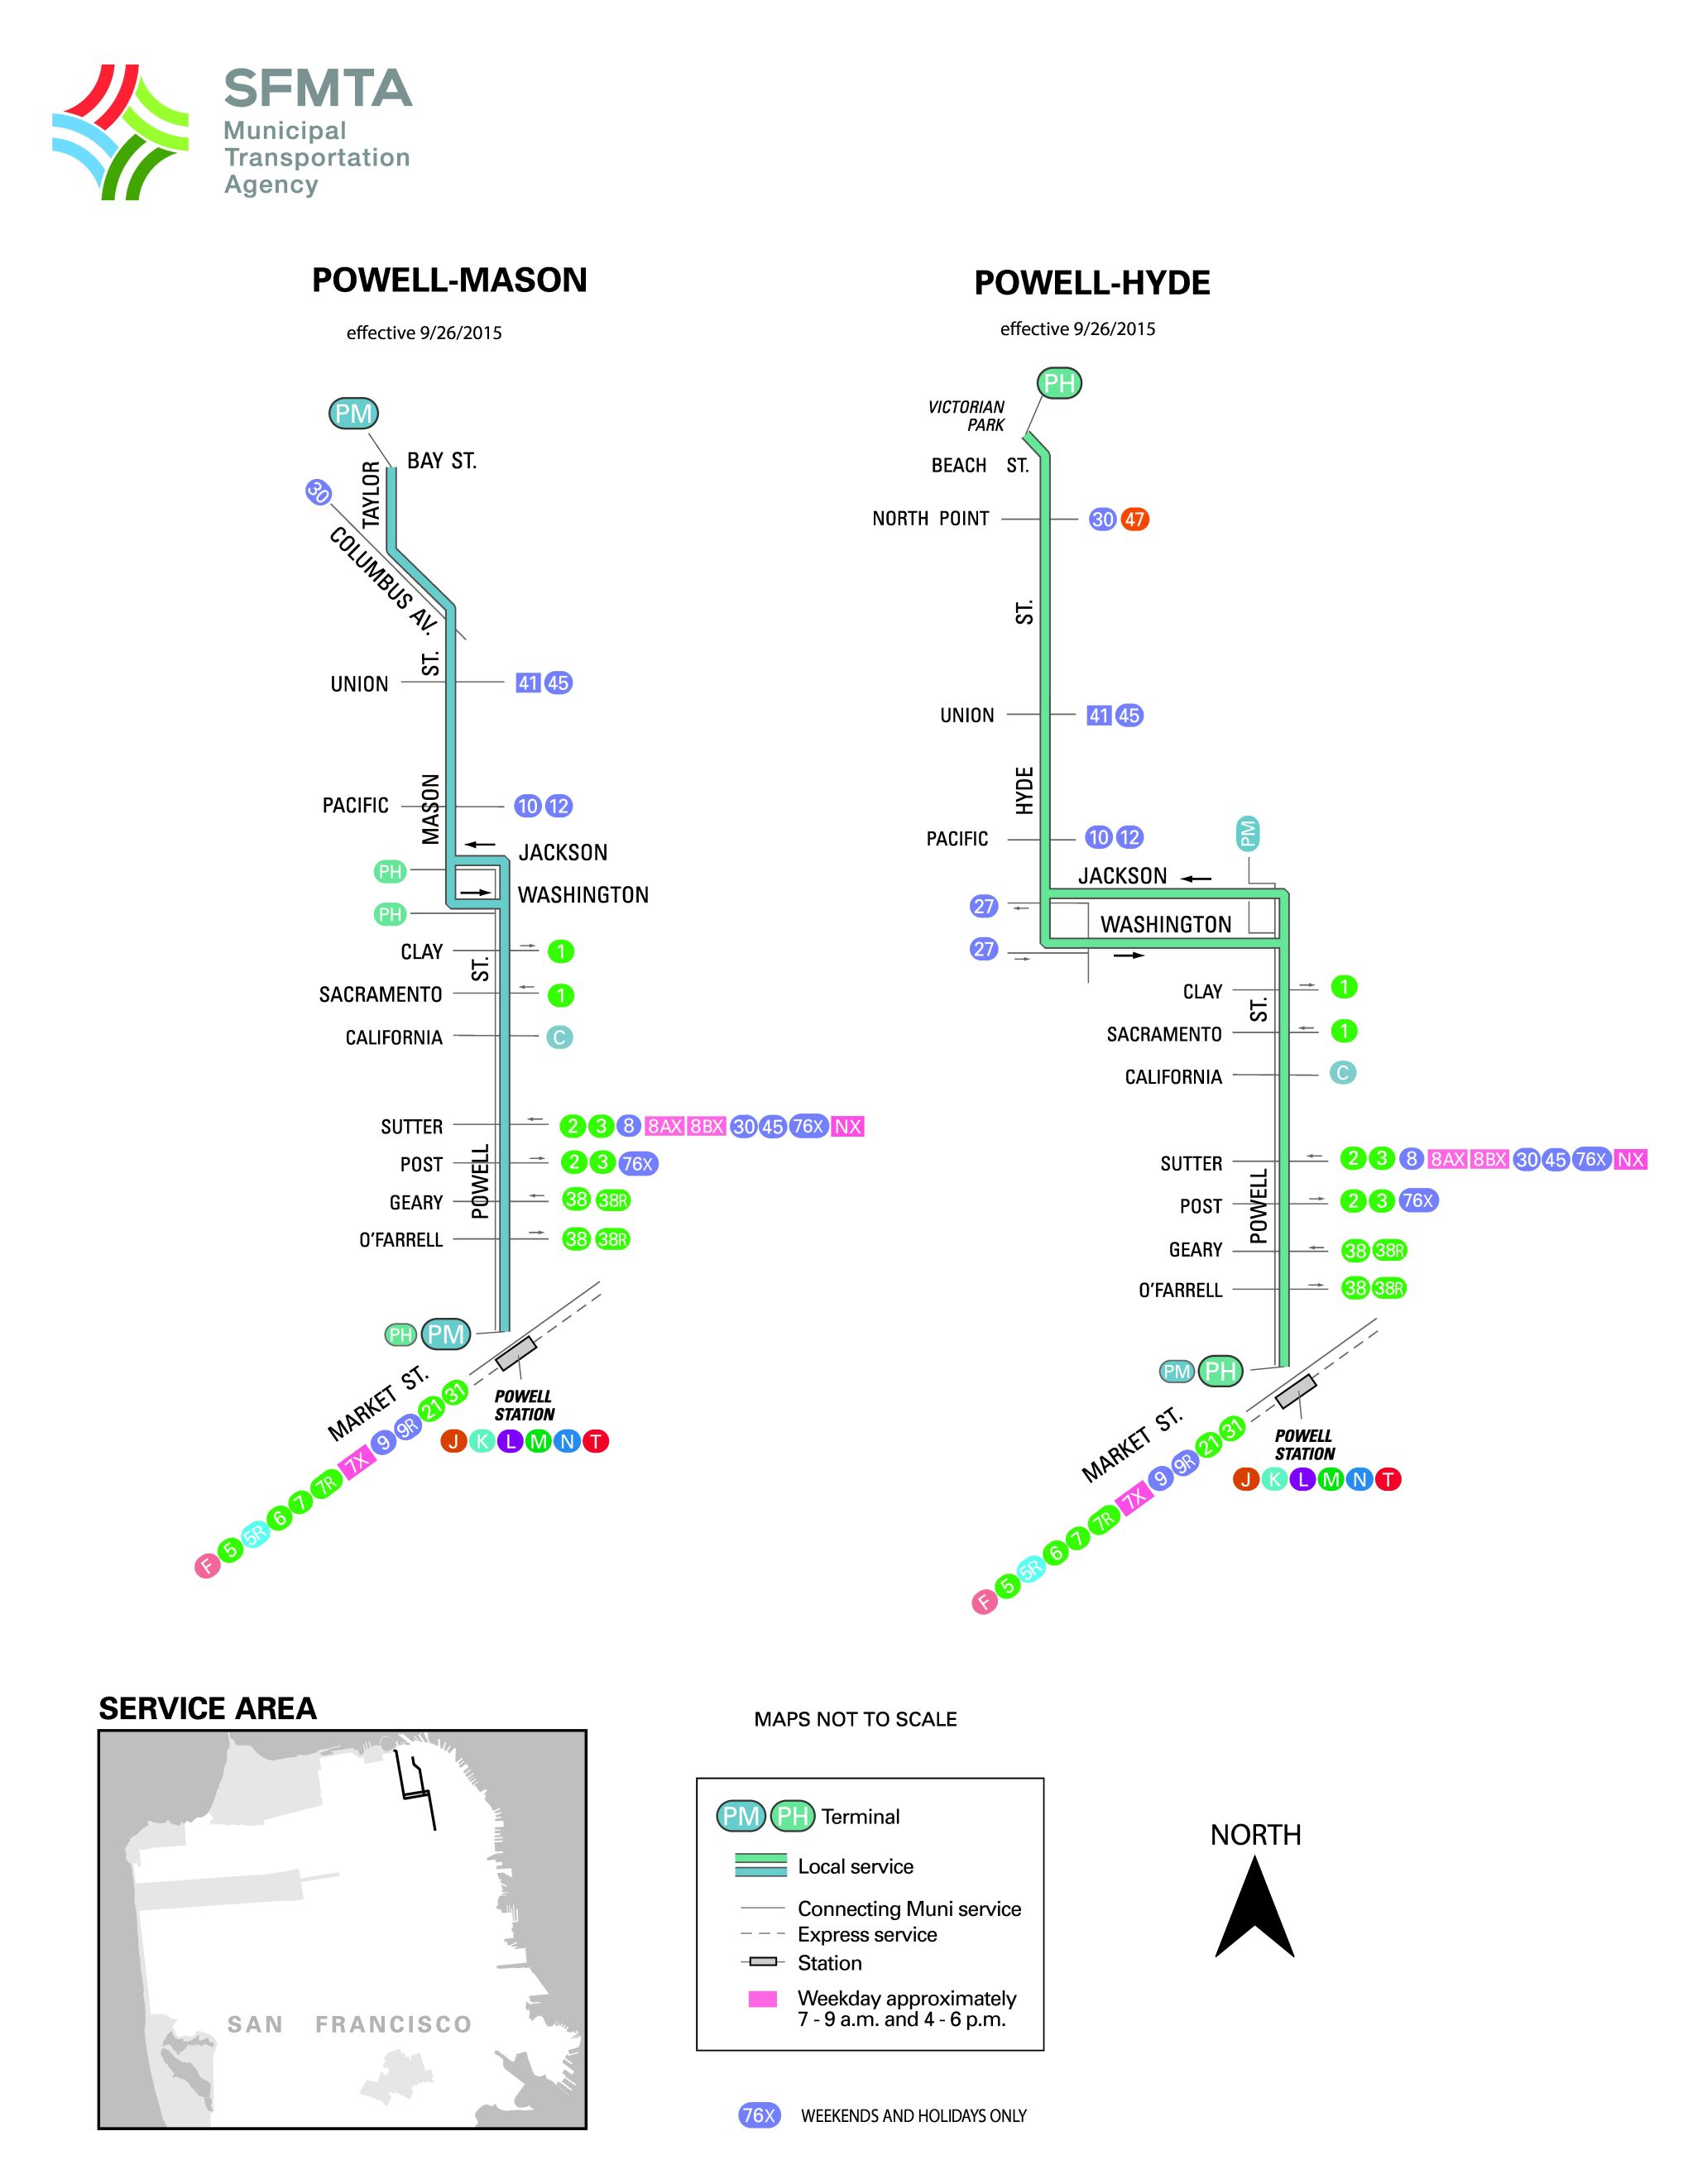 PowellHyde Cable Car Route SF MUNI SF Bay Transit